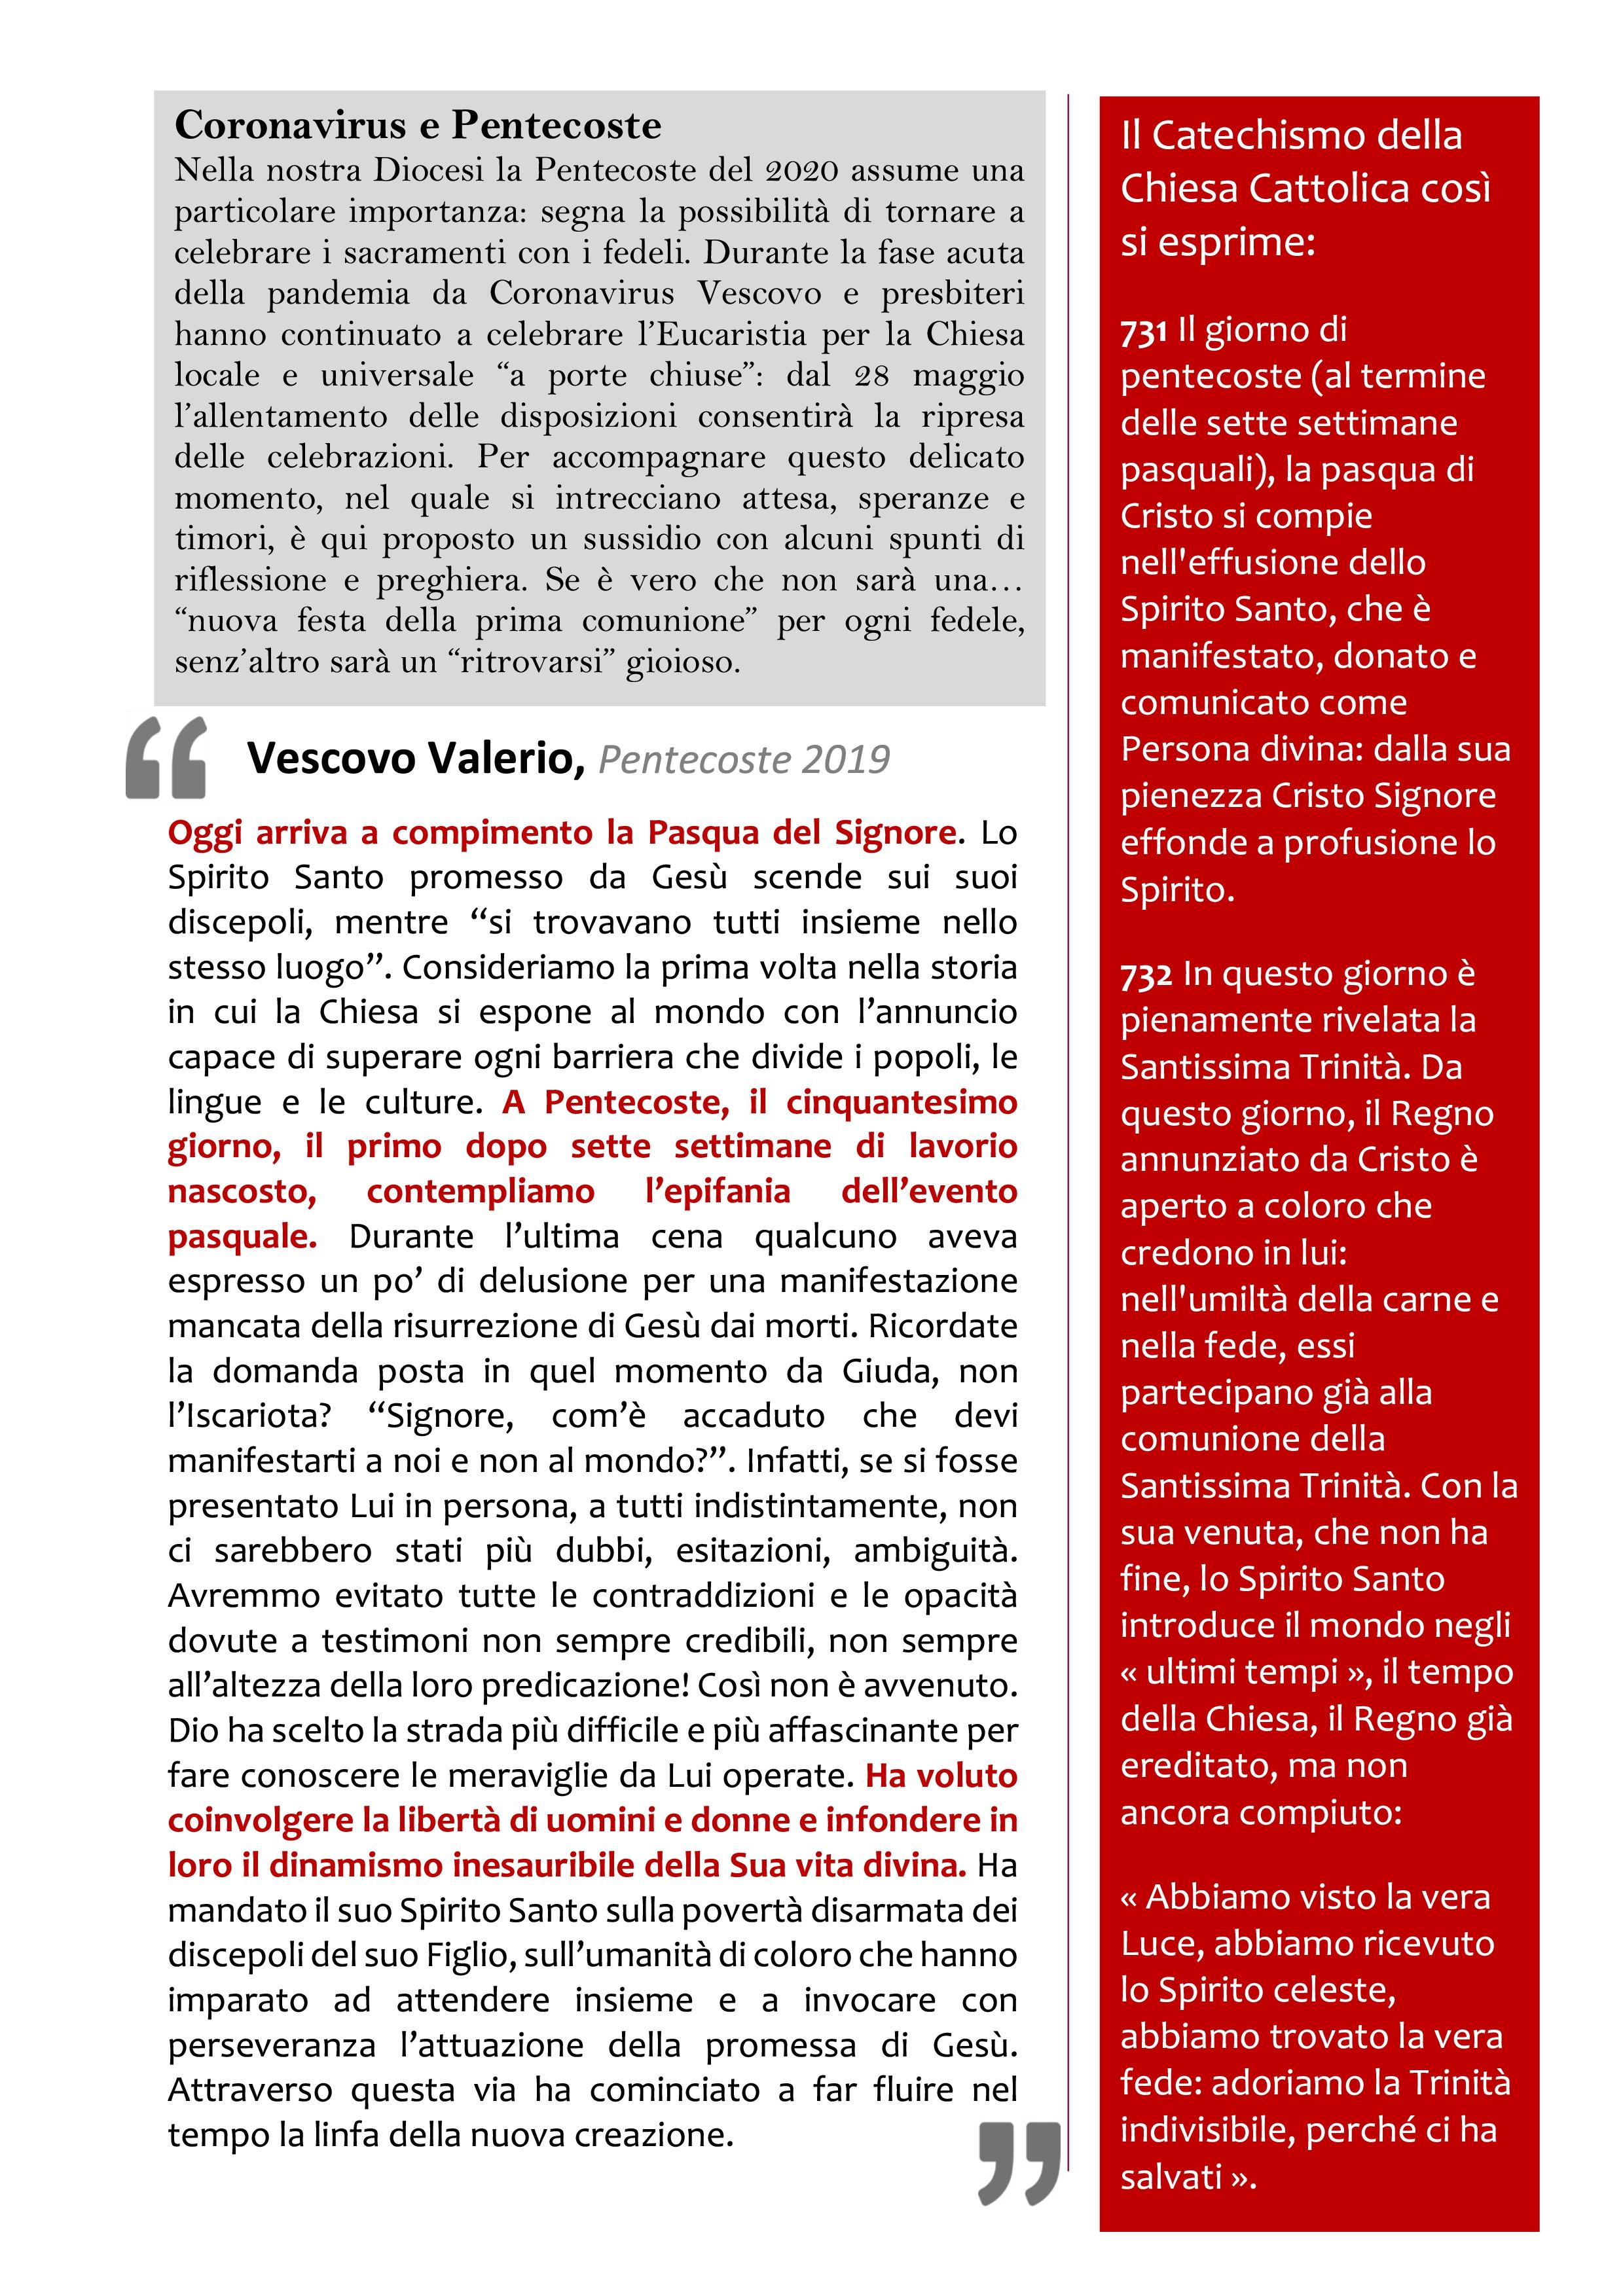 2020 - Coronavirus - Pentecoste_romano-002